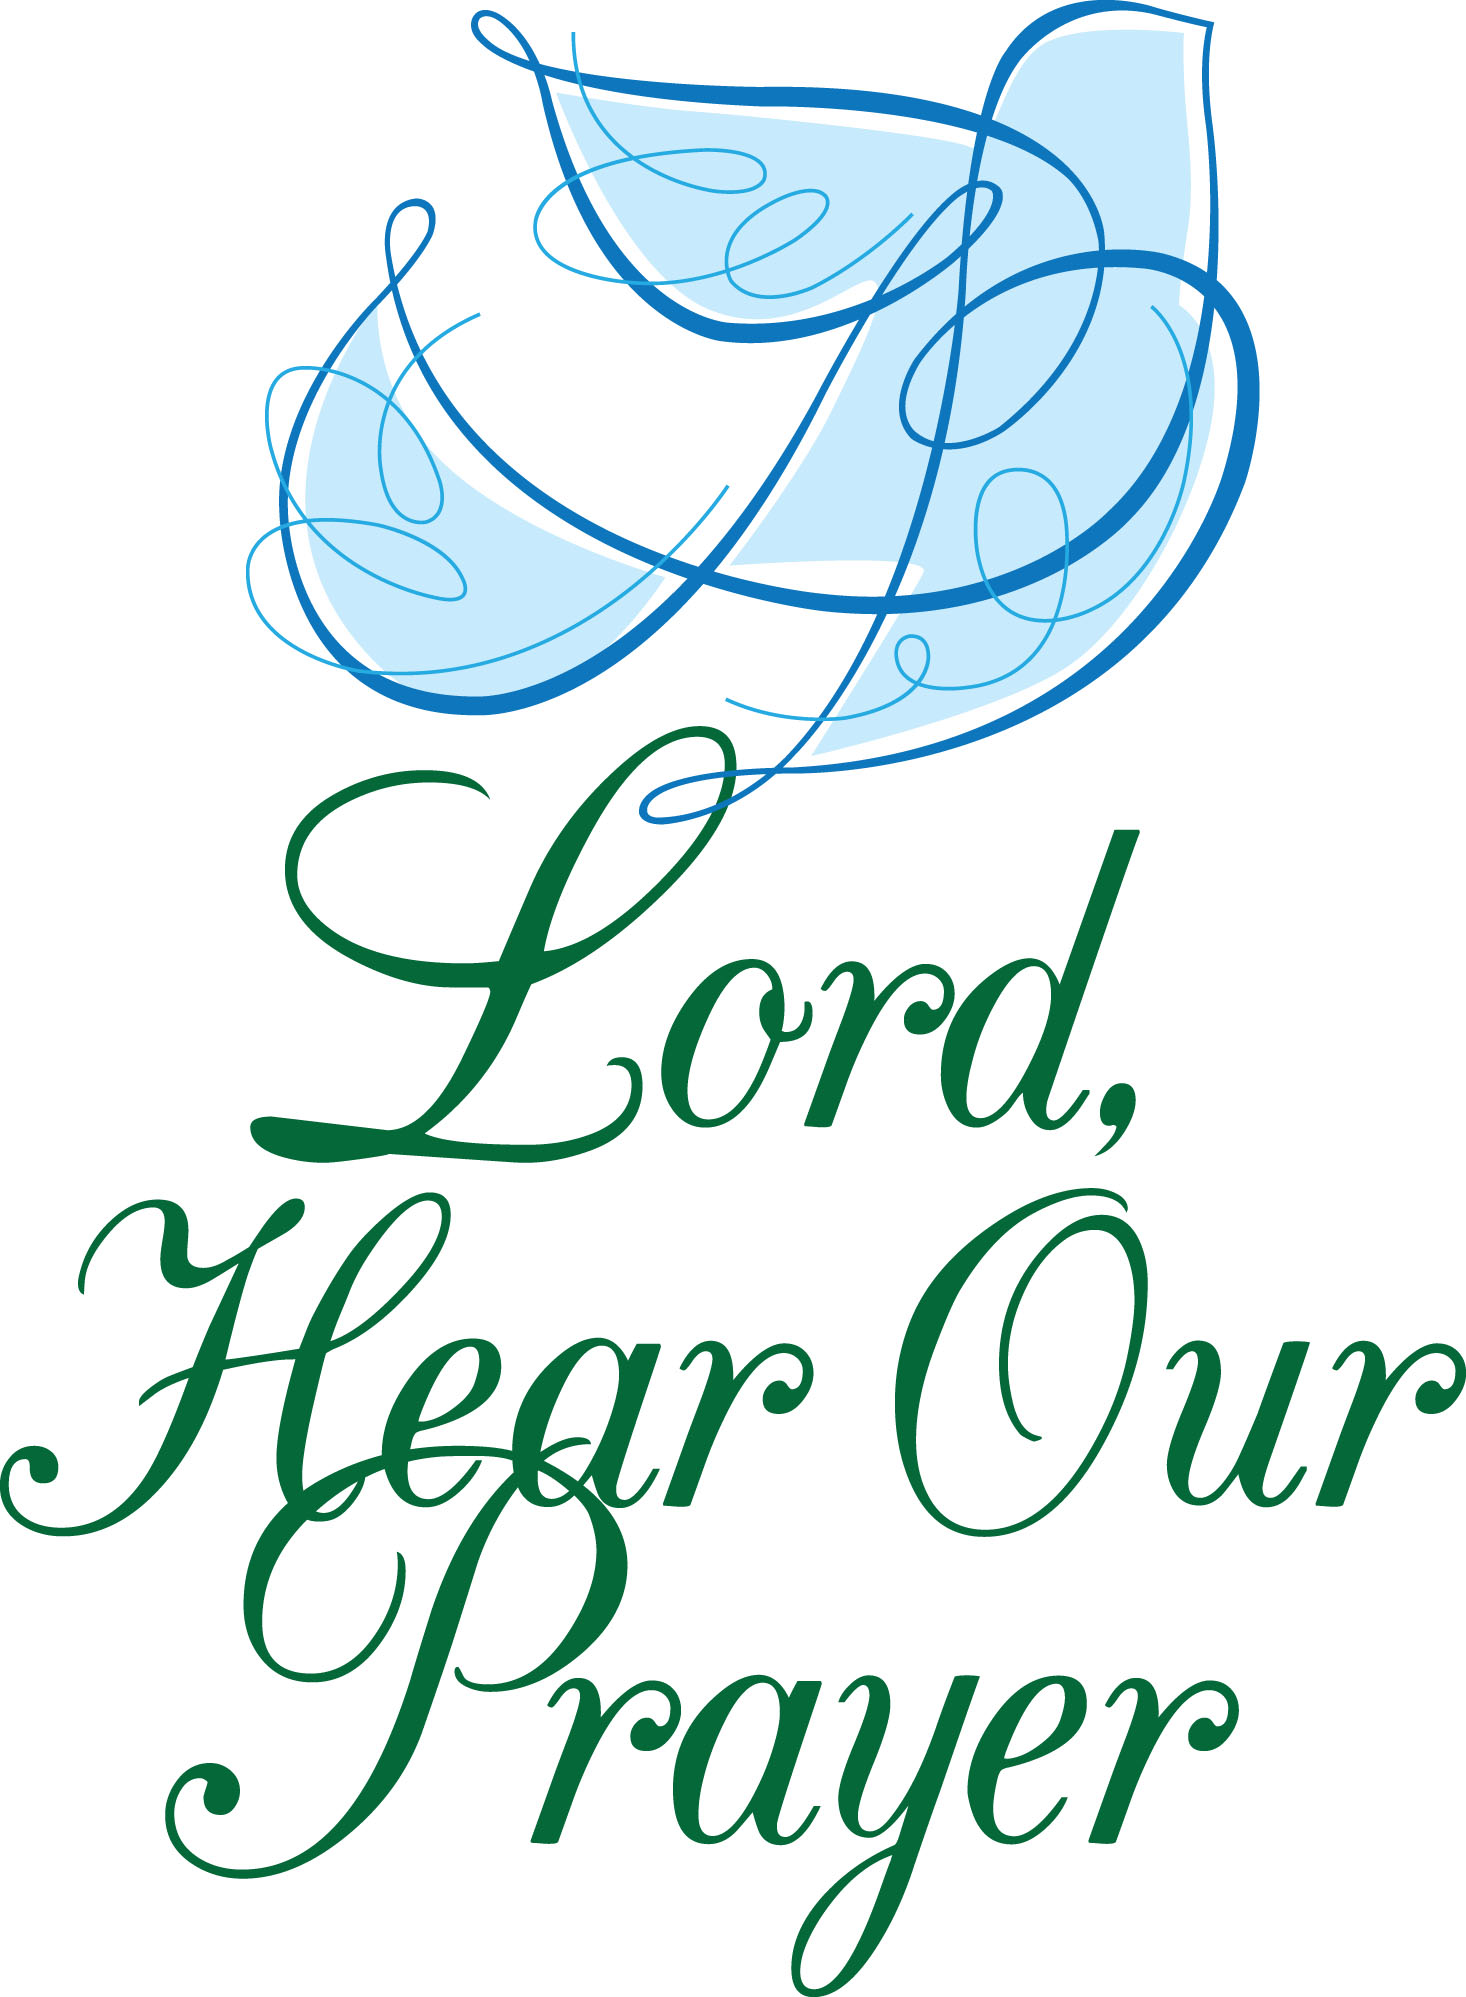 clipart on prayer - photo #1